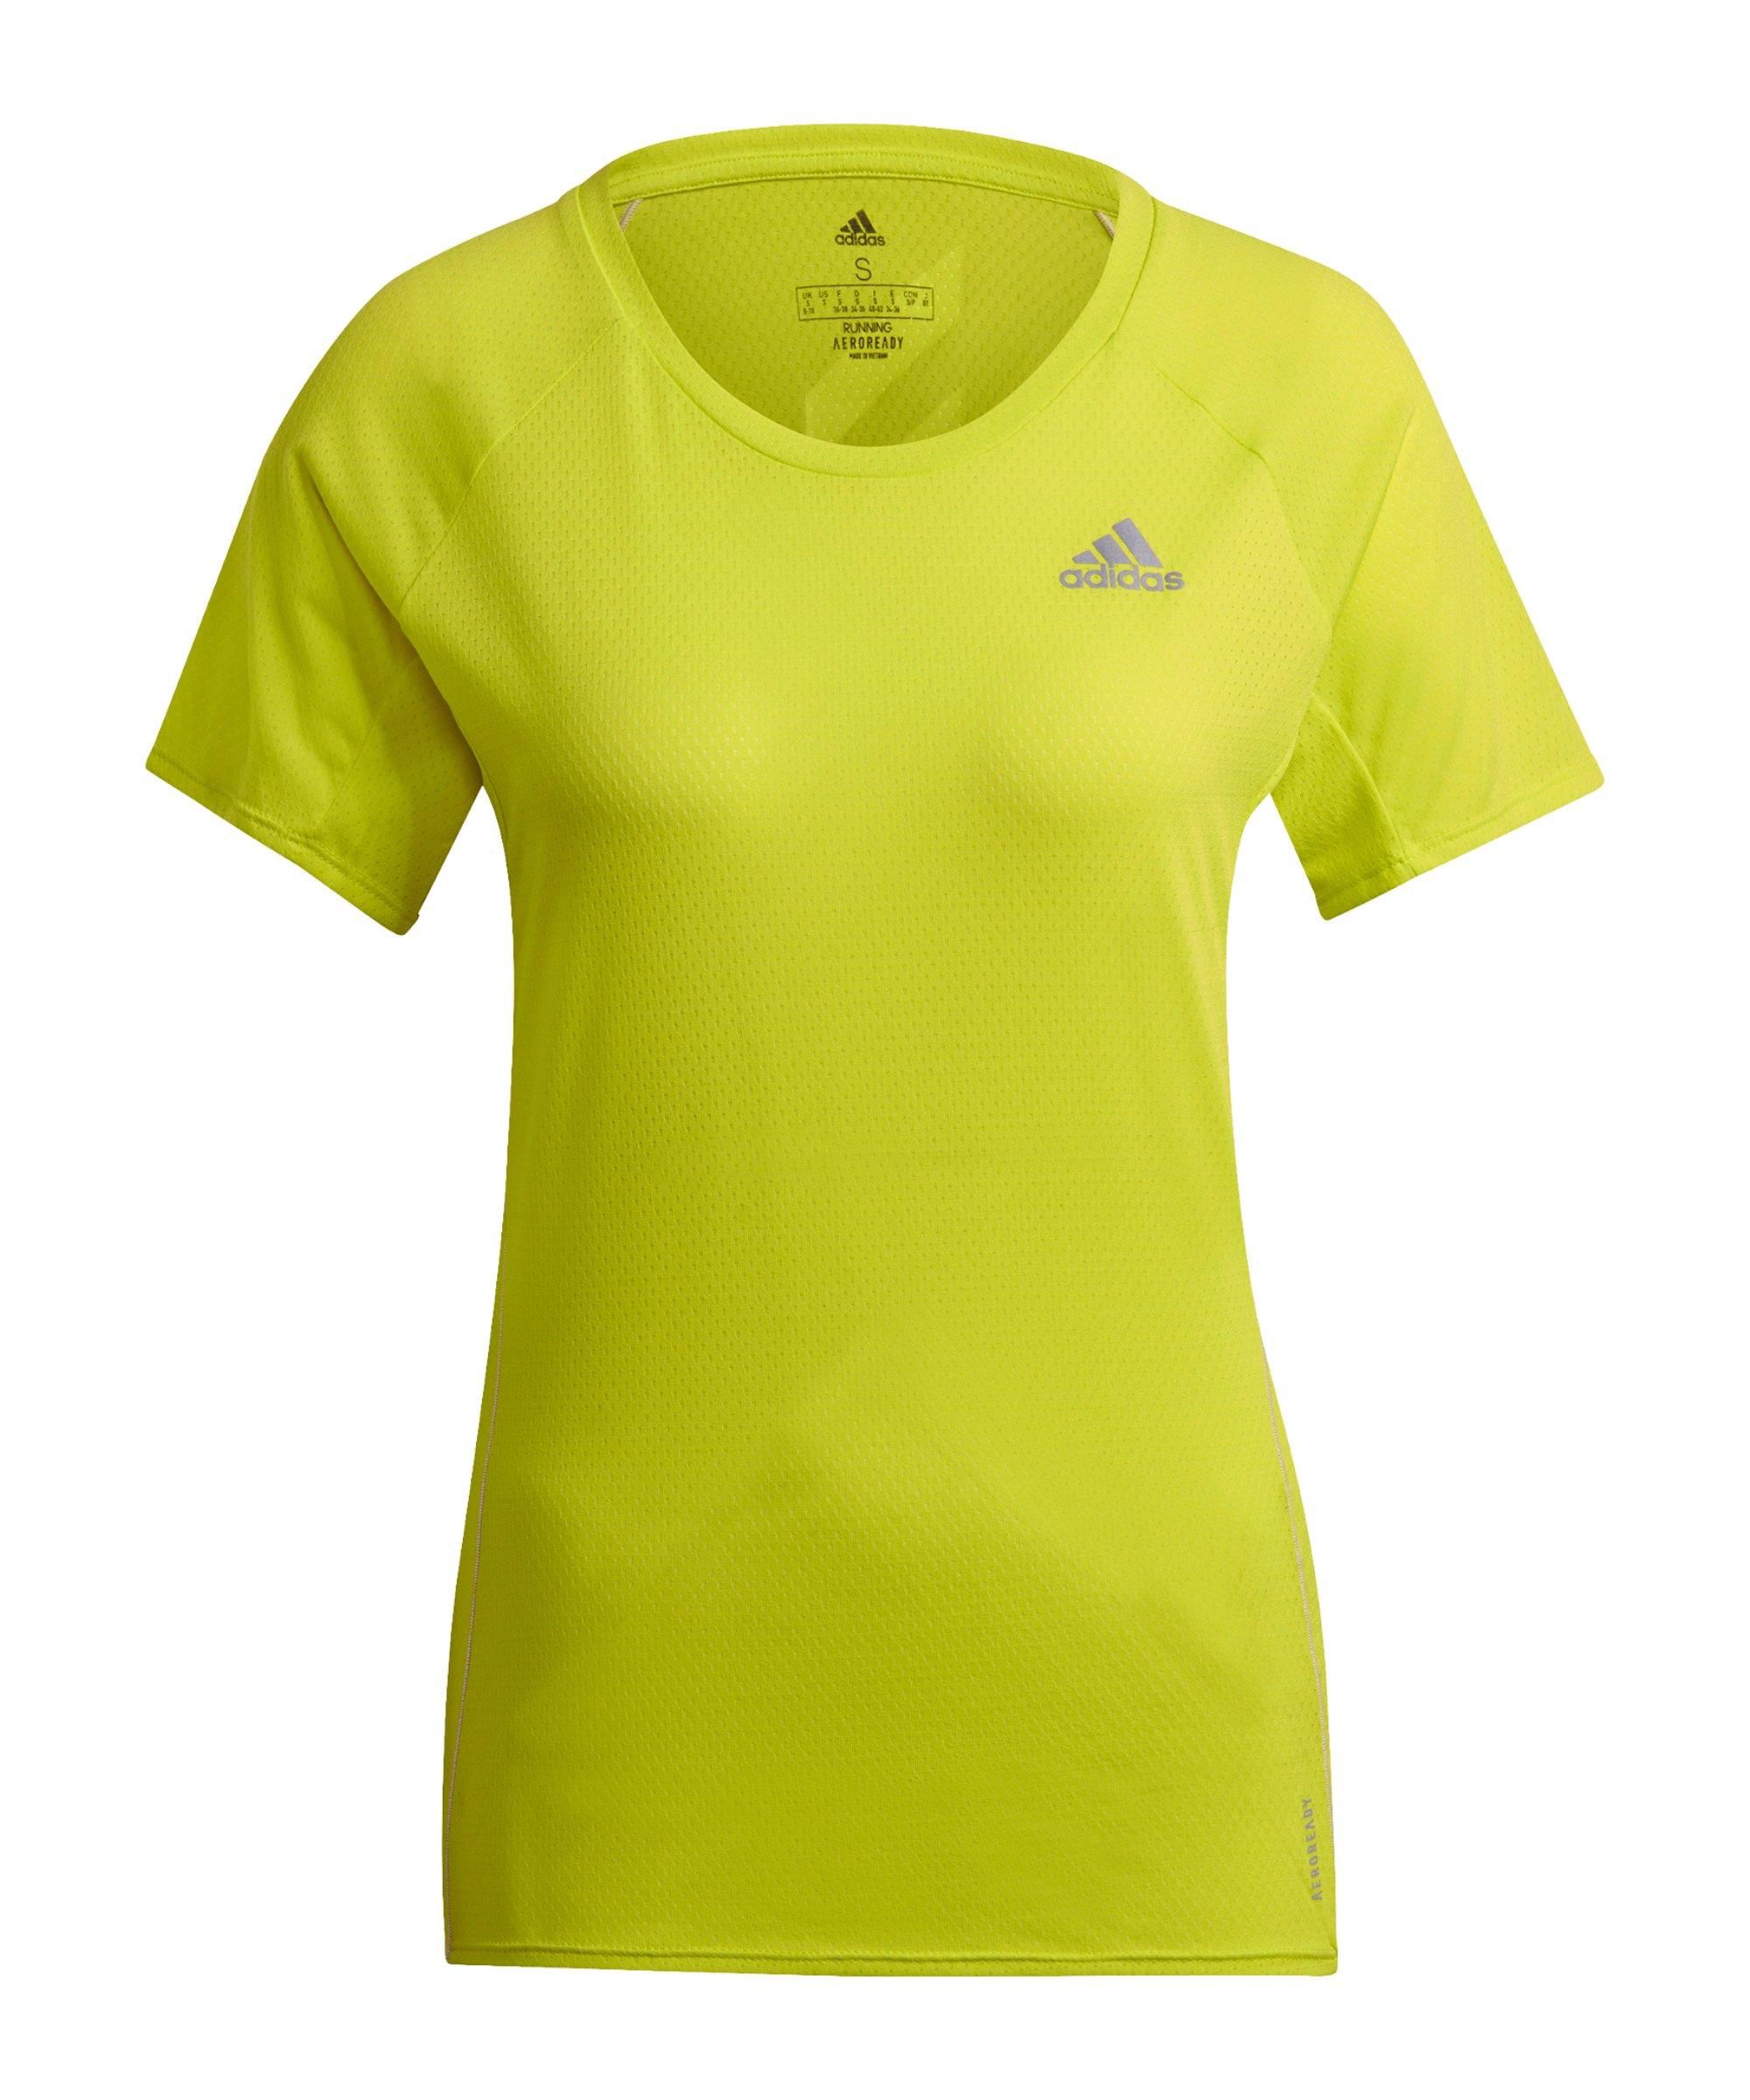 adidas Adi Runner T-Shirt Running Damen Gelb - gelb